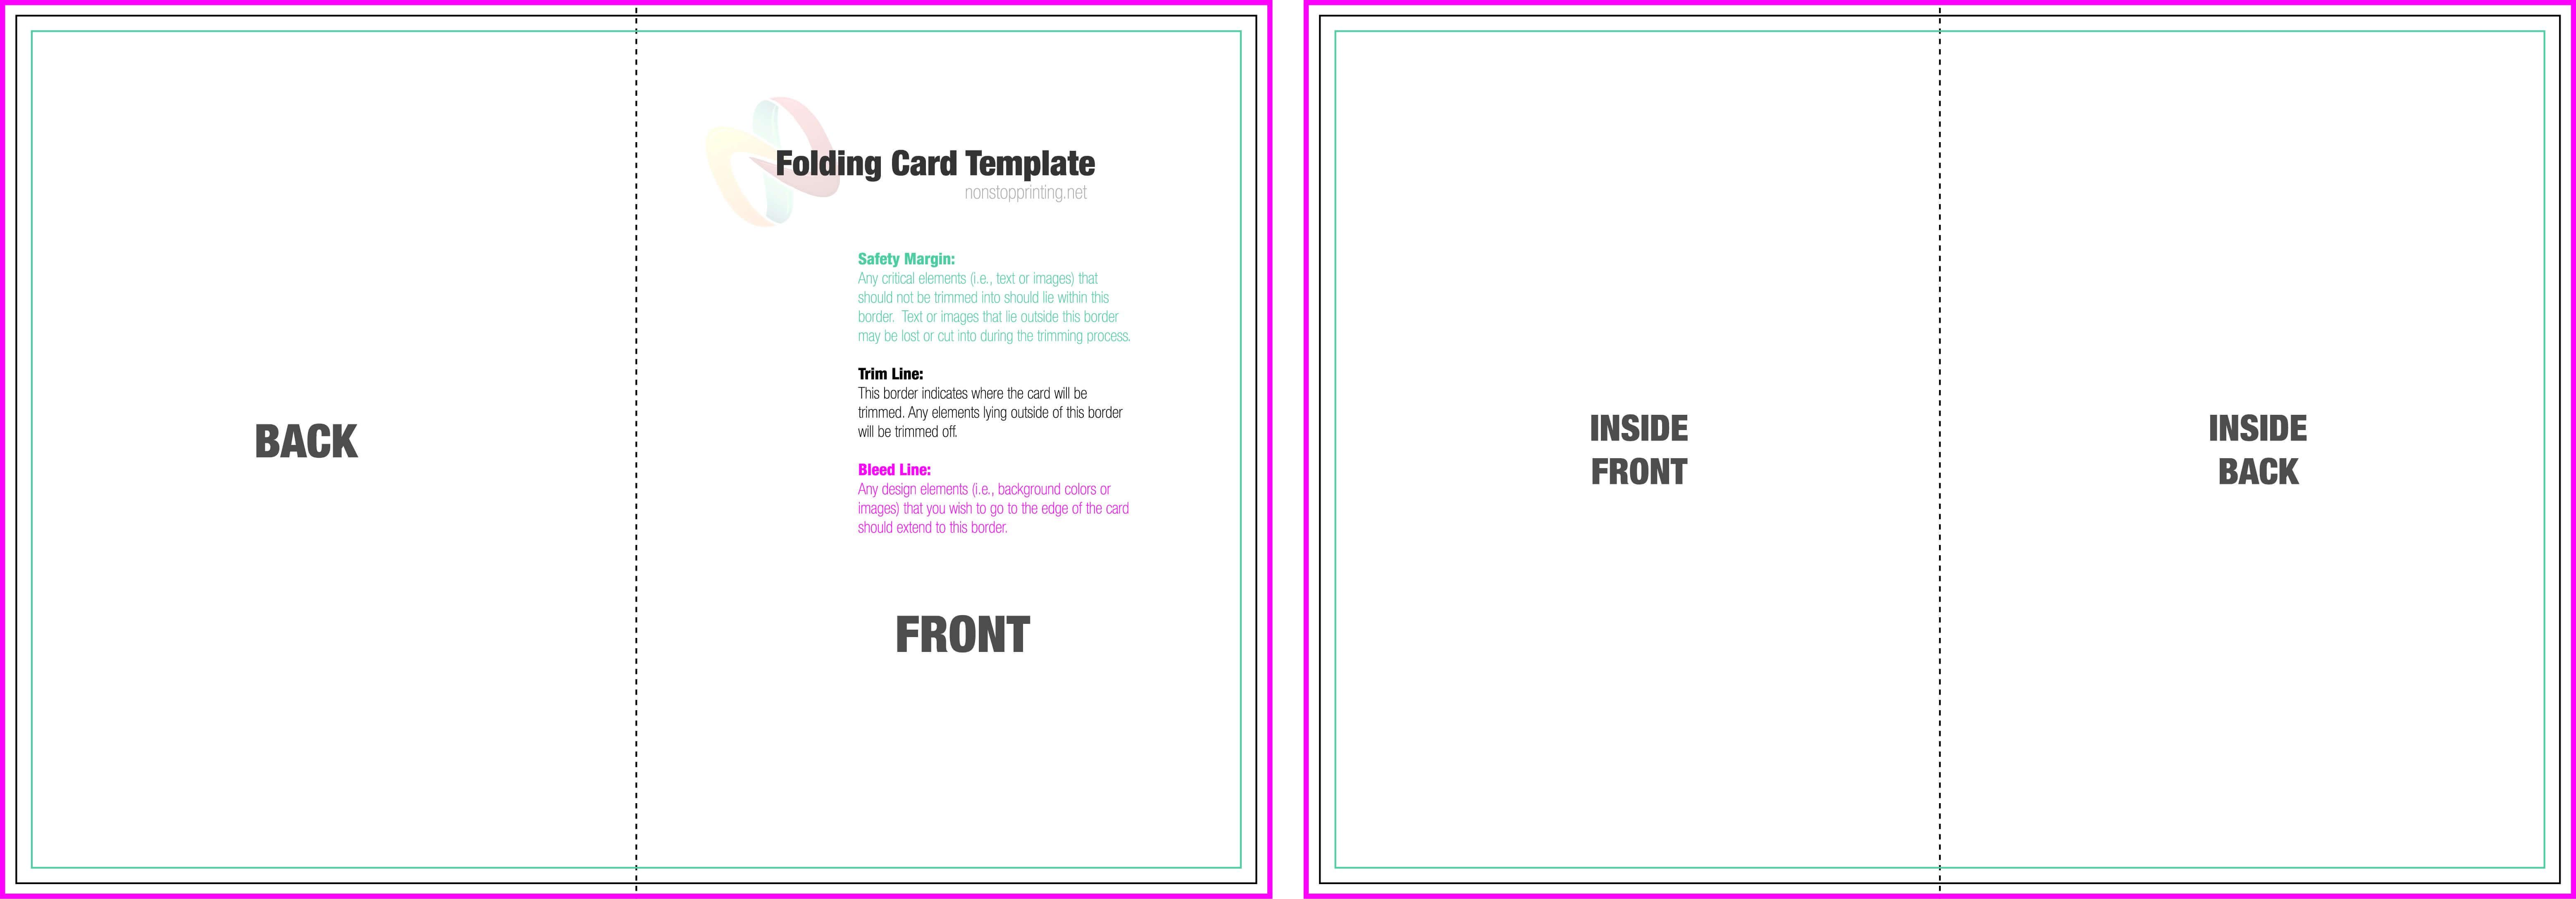 007 Half Fold Brochuree Free Microsoft Word Birthday Card With Regard To Birthday Card Indesign Template